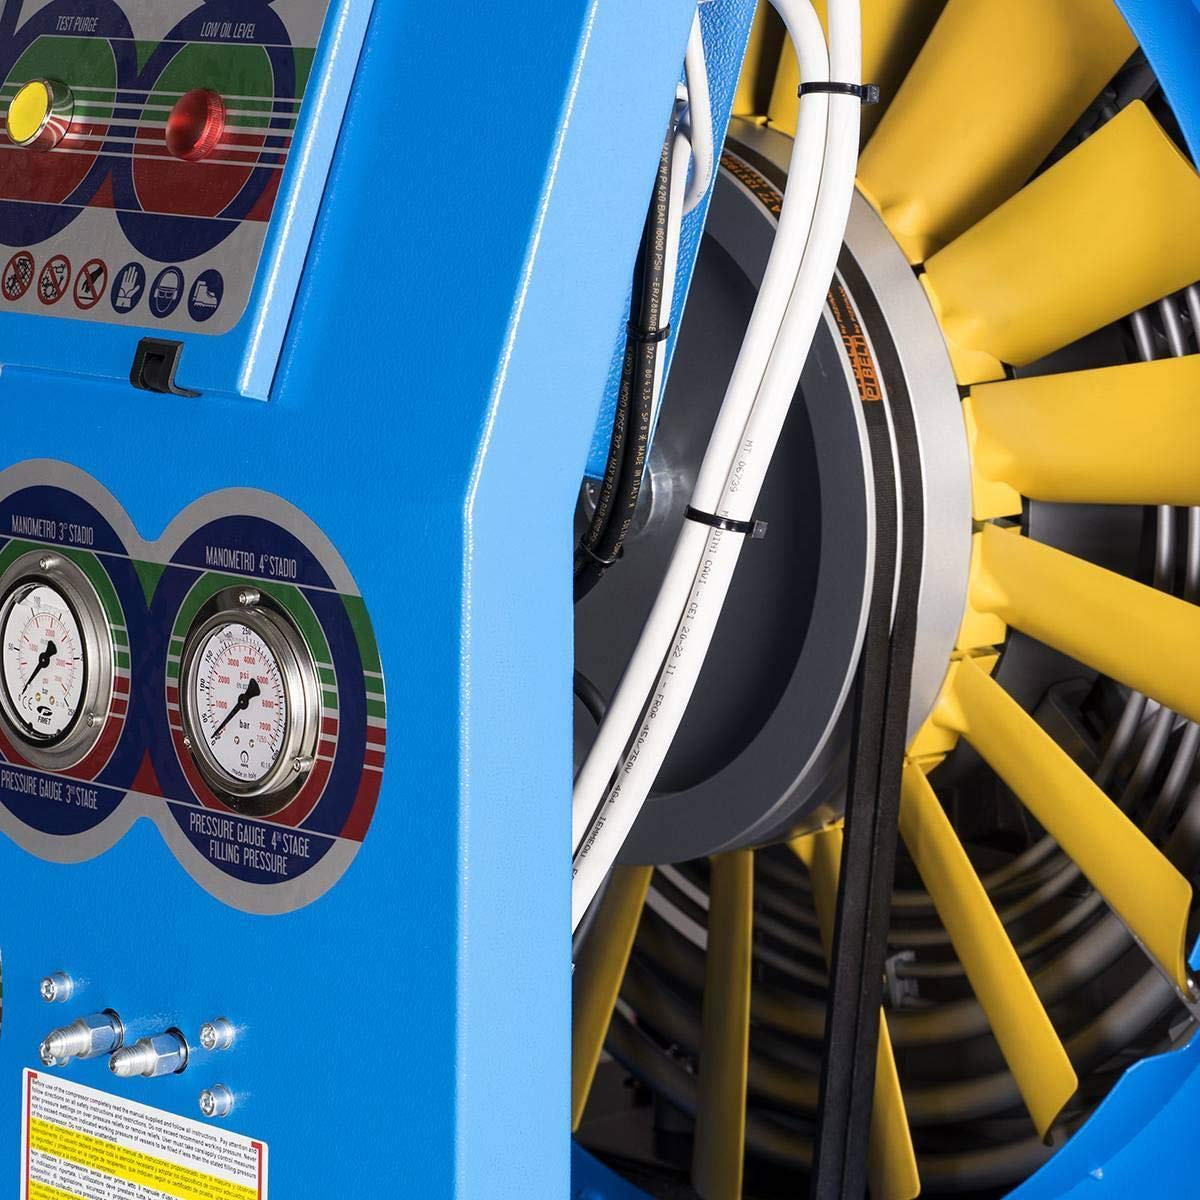 420 bar Max Coltri breathing compressor filling capacity 450 litres/min